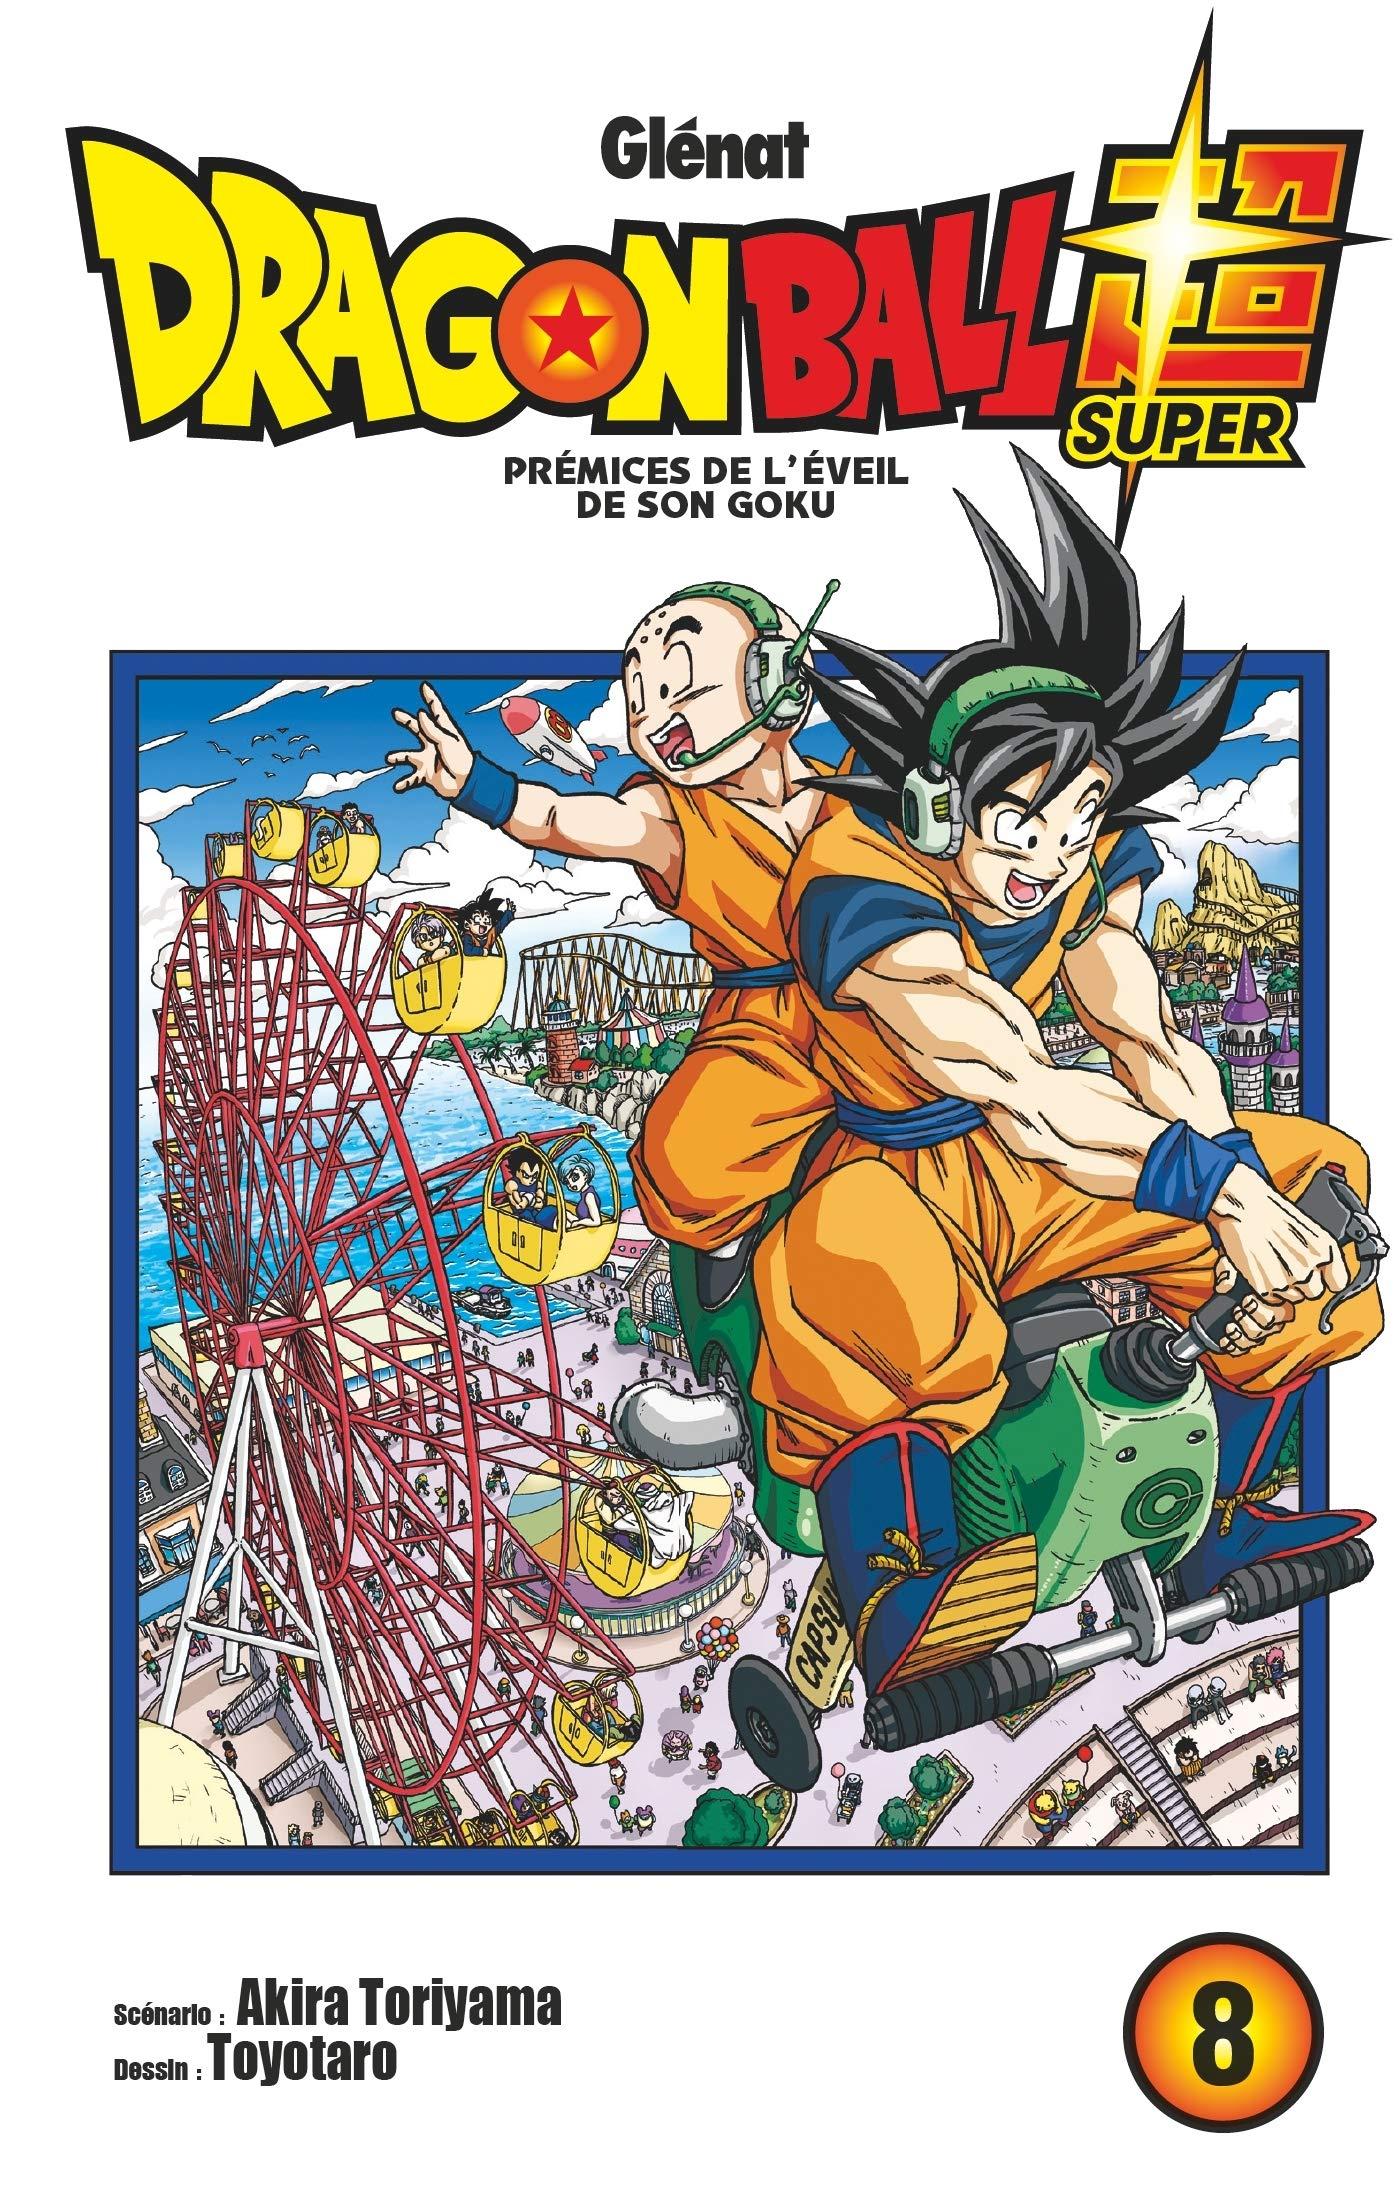 Dragon Ball Super Tome 8   Prémices De L'éveil De Son Goku